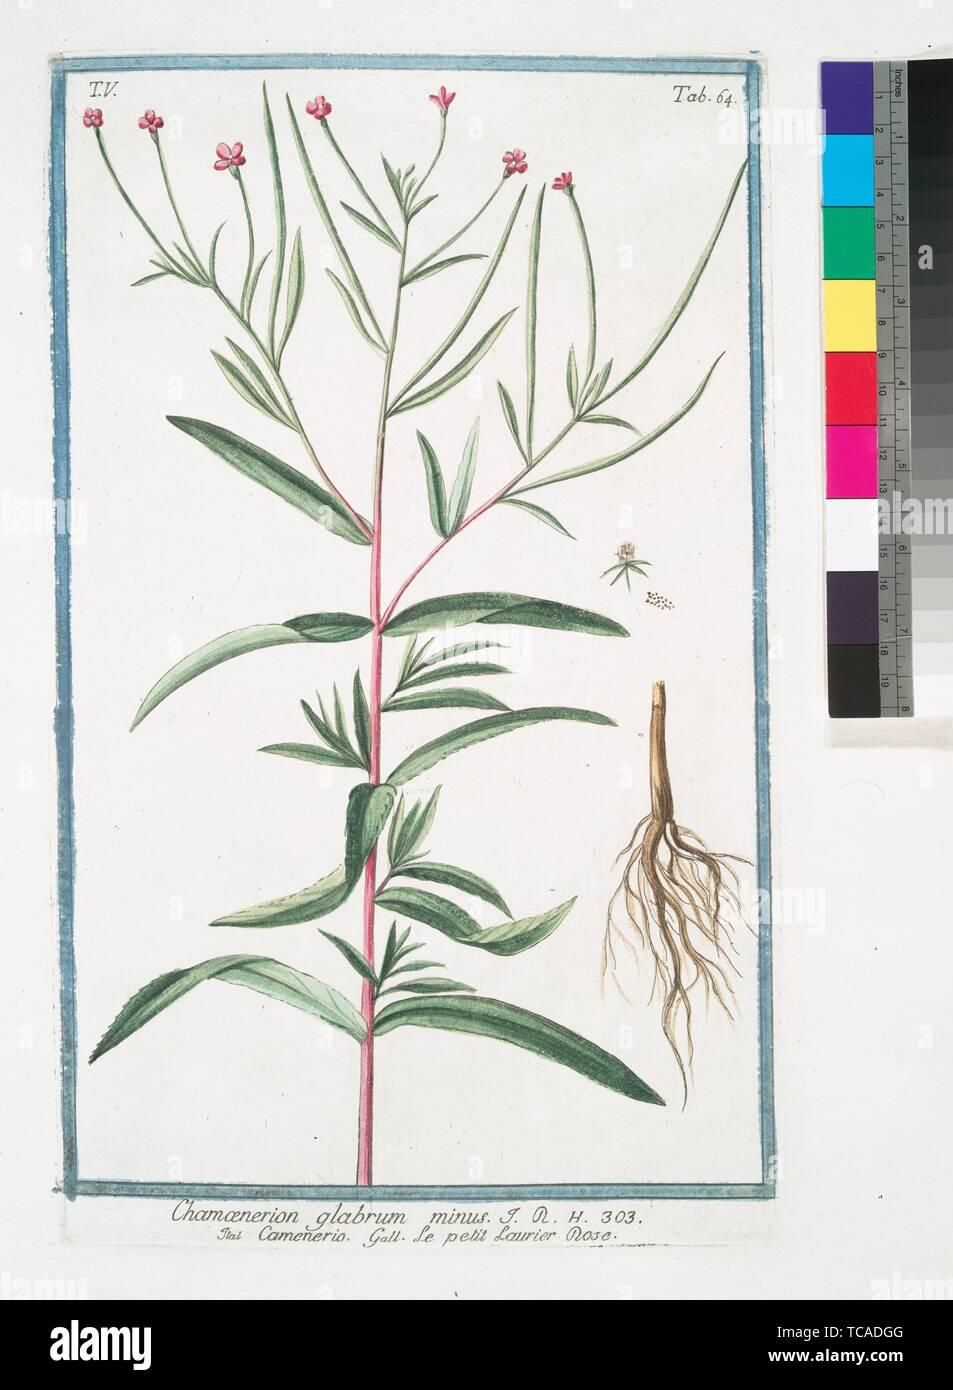 Chamaenerion glabrum minus = Camenerio = Le petit Laurier Rose. [Smooth Fireweed]. Bonelli, Giorgio (b. 1724) (Author) Martelli, Niccoló (1735-1829) Stock Photo